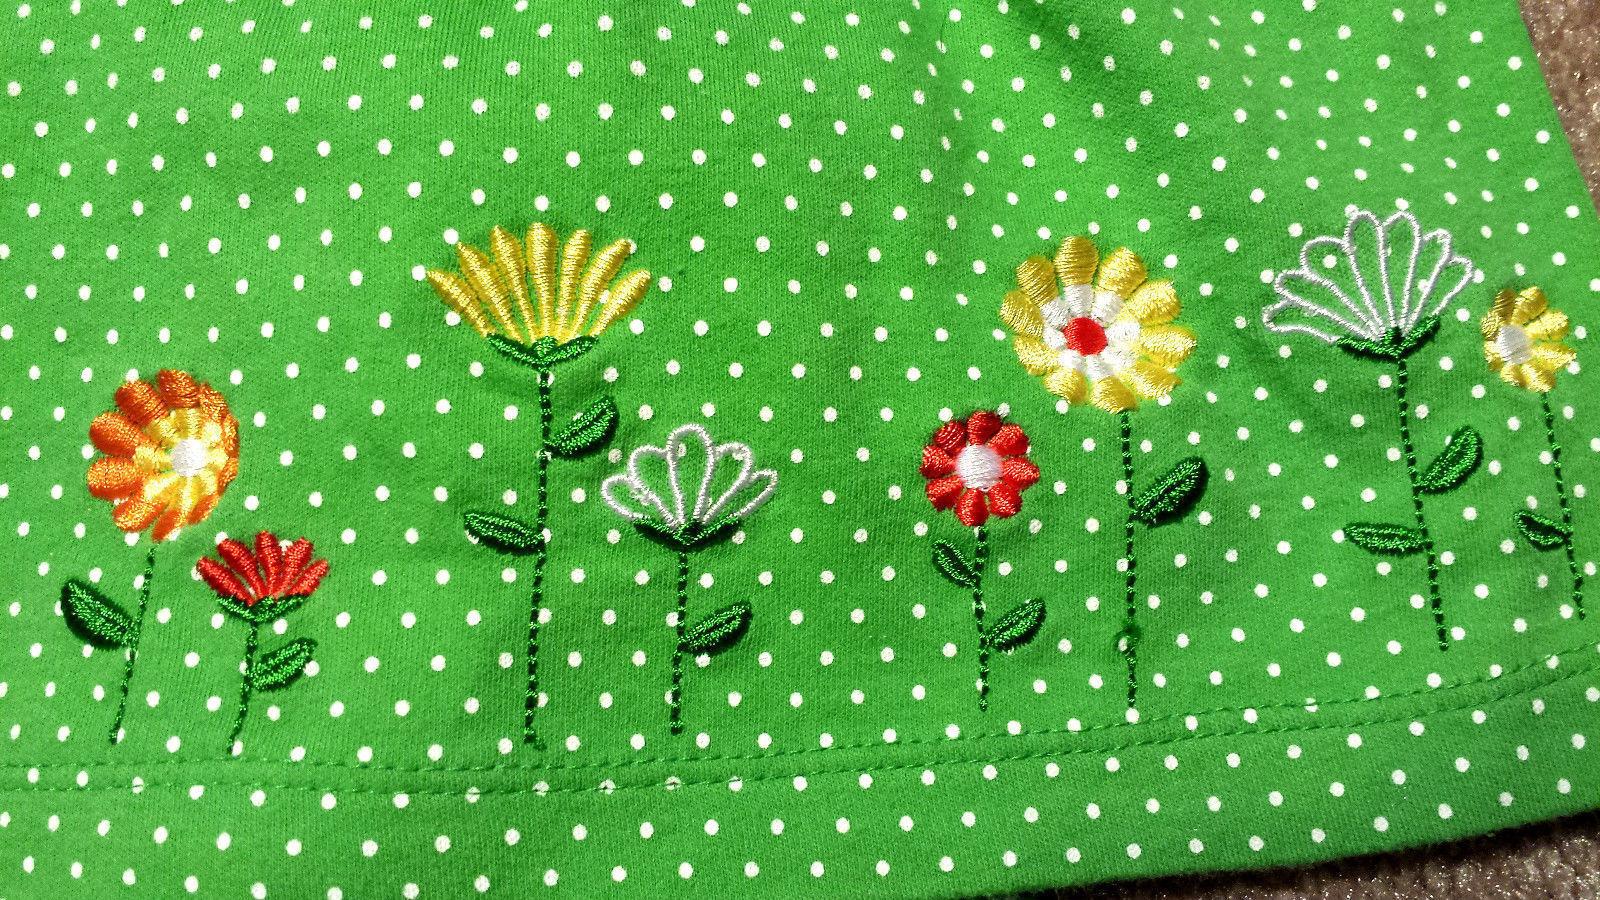 Girl's Size 3 M 0-3 Months Two Piece Carter's Green Floral Dress & Capri Pants